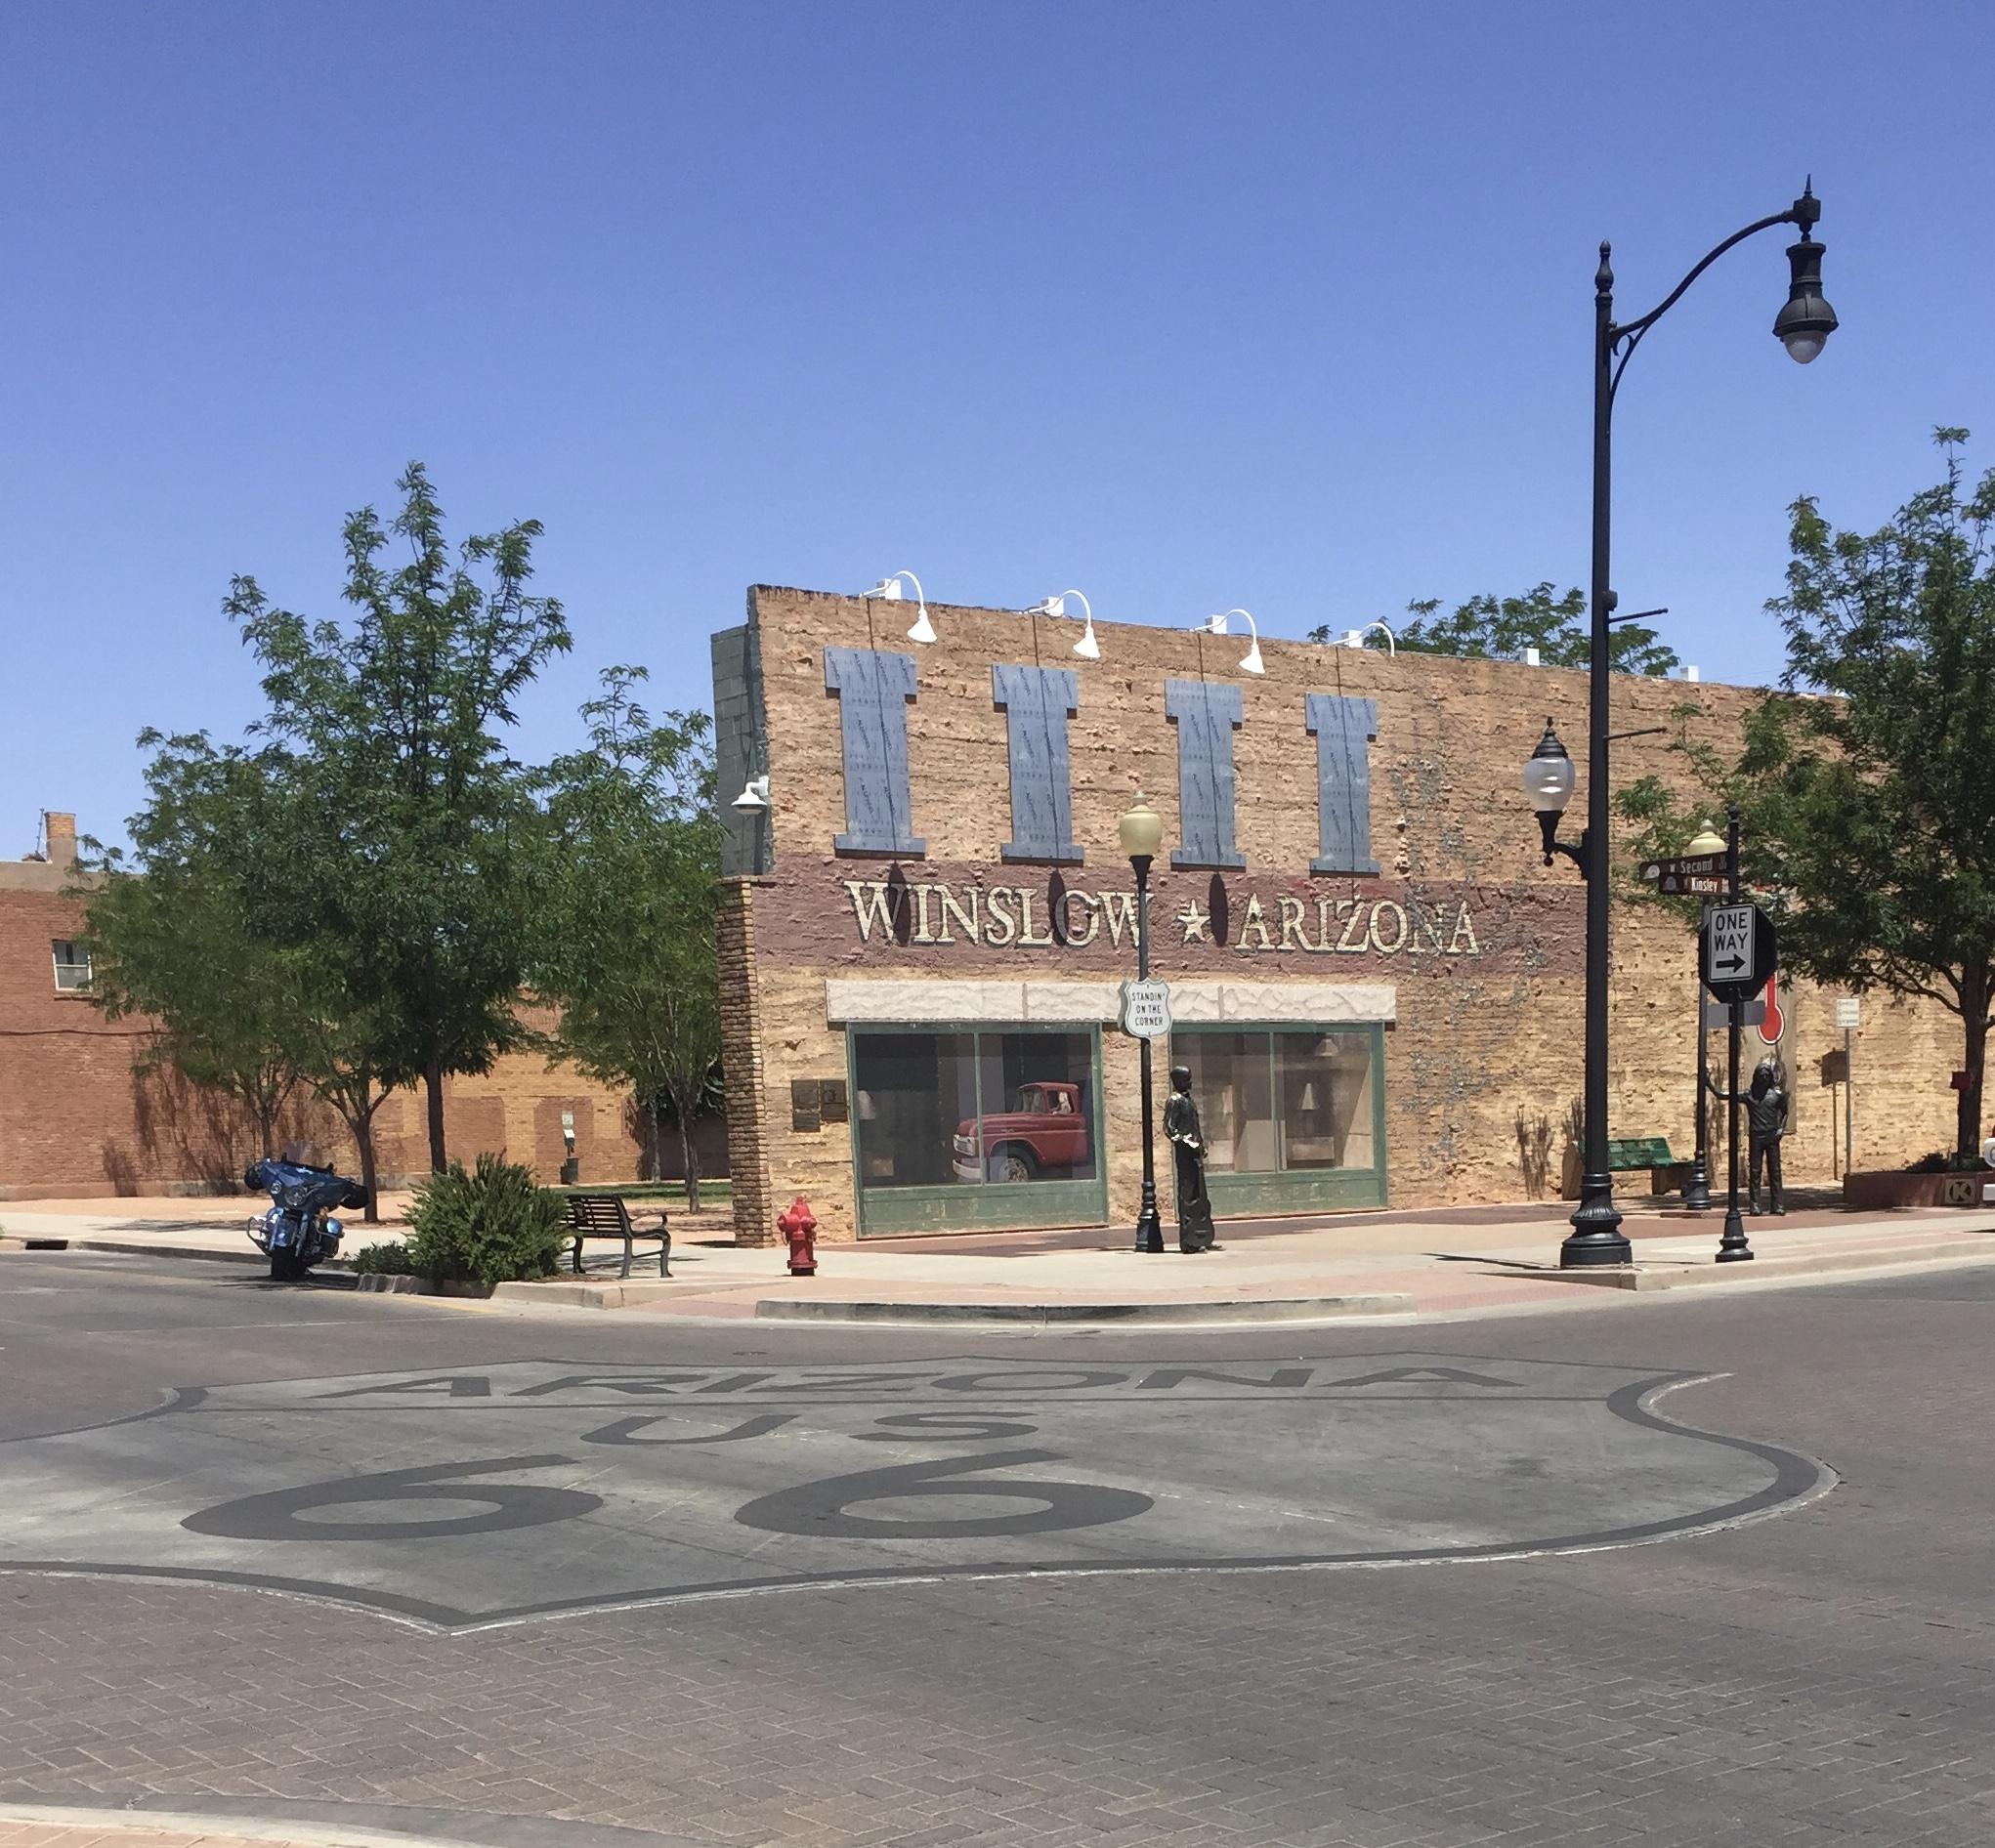 Winslow Arizona on Route 66